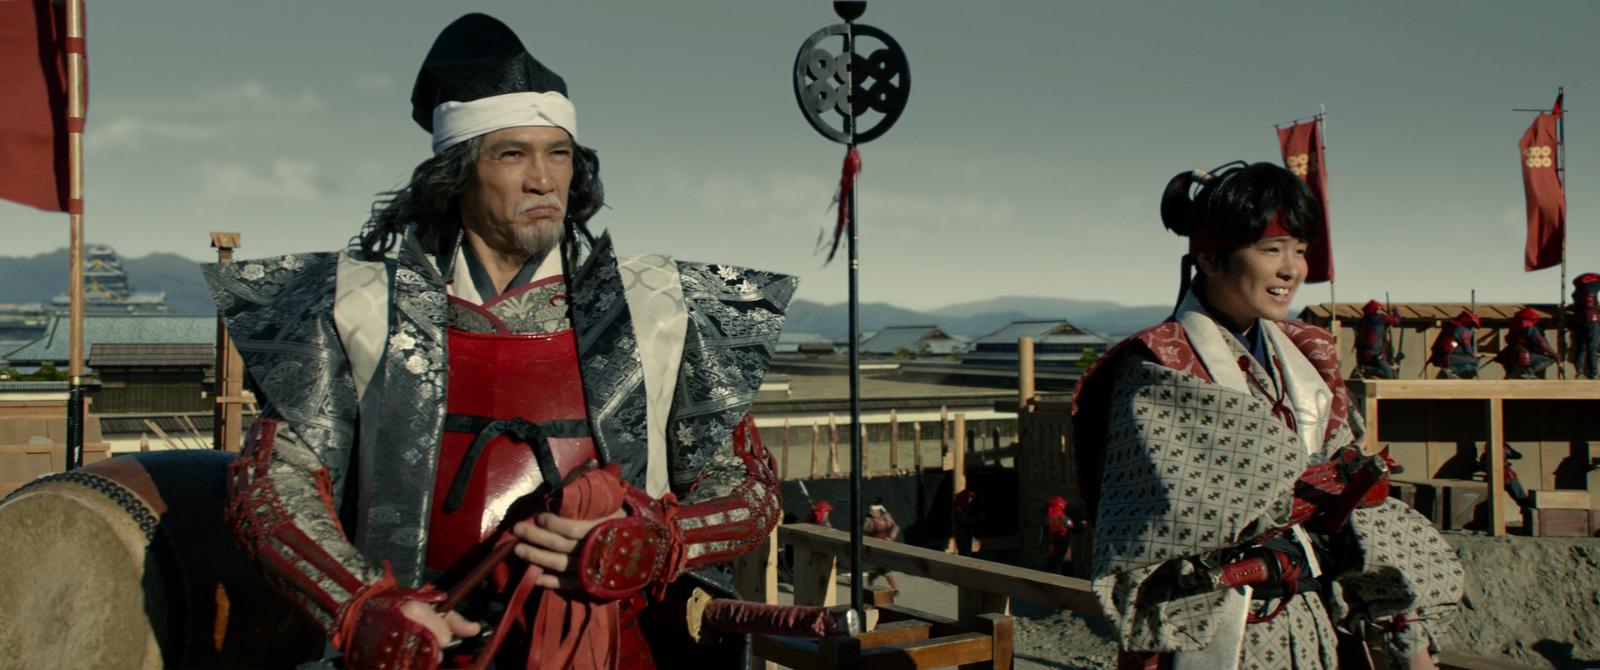 JAPANESE MOVIE Brave 10 Live Action Movie English Subtitles Ship From USA